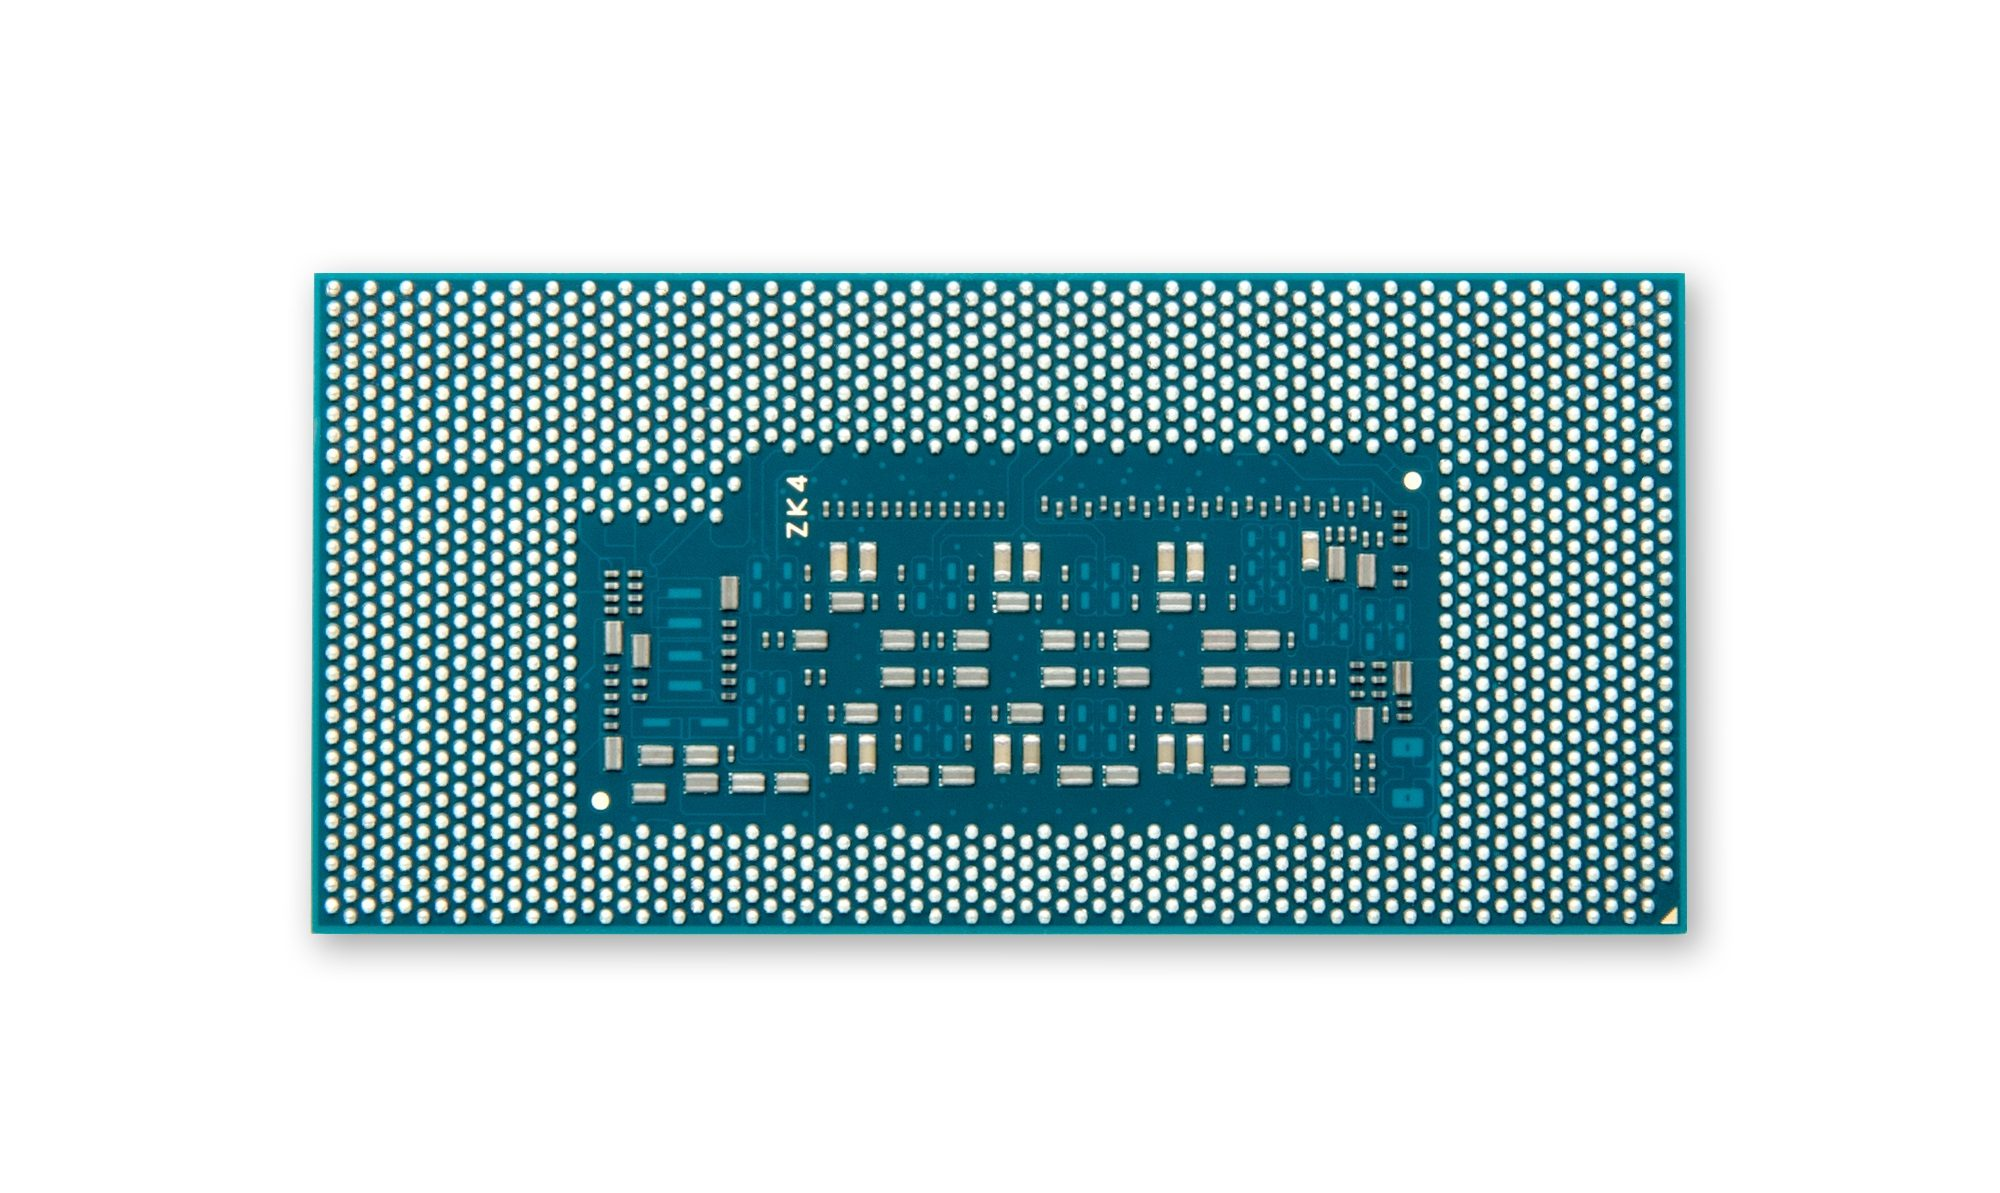 Intel-NNP-I-back